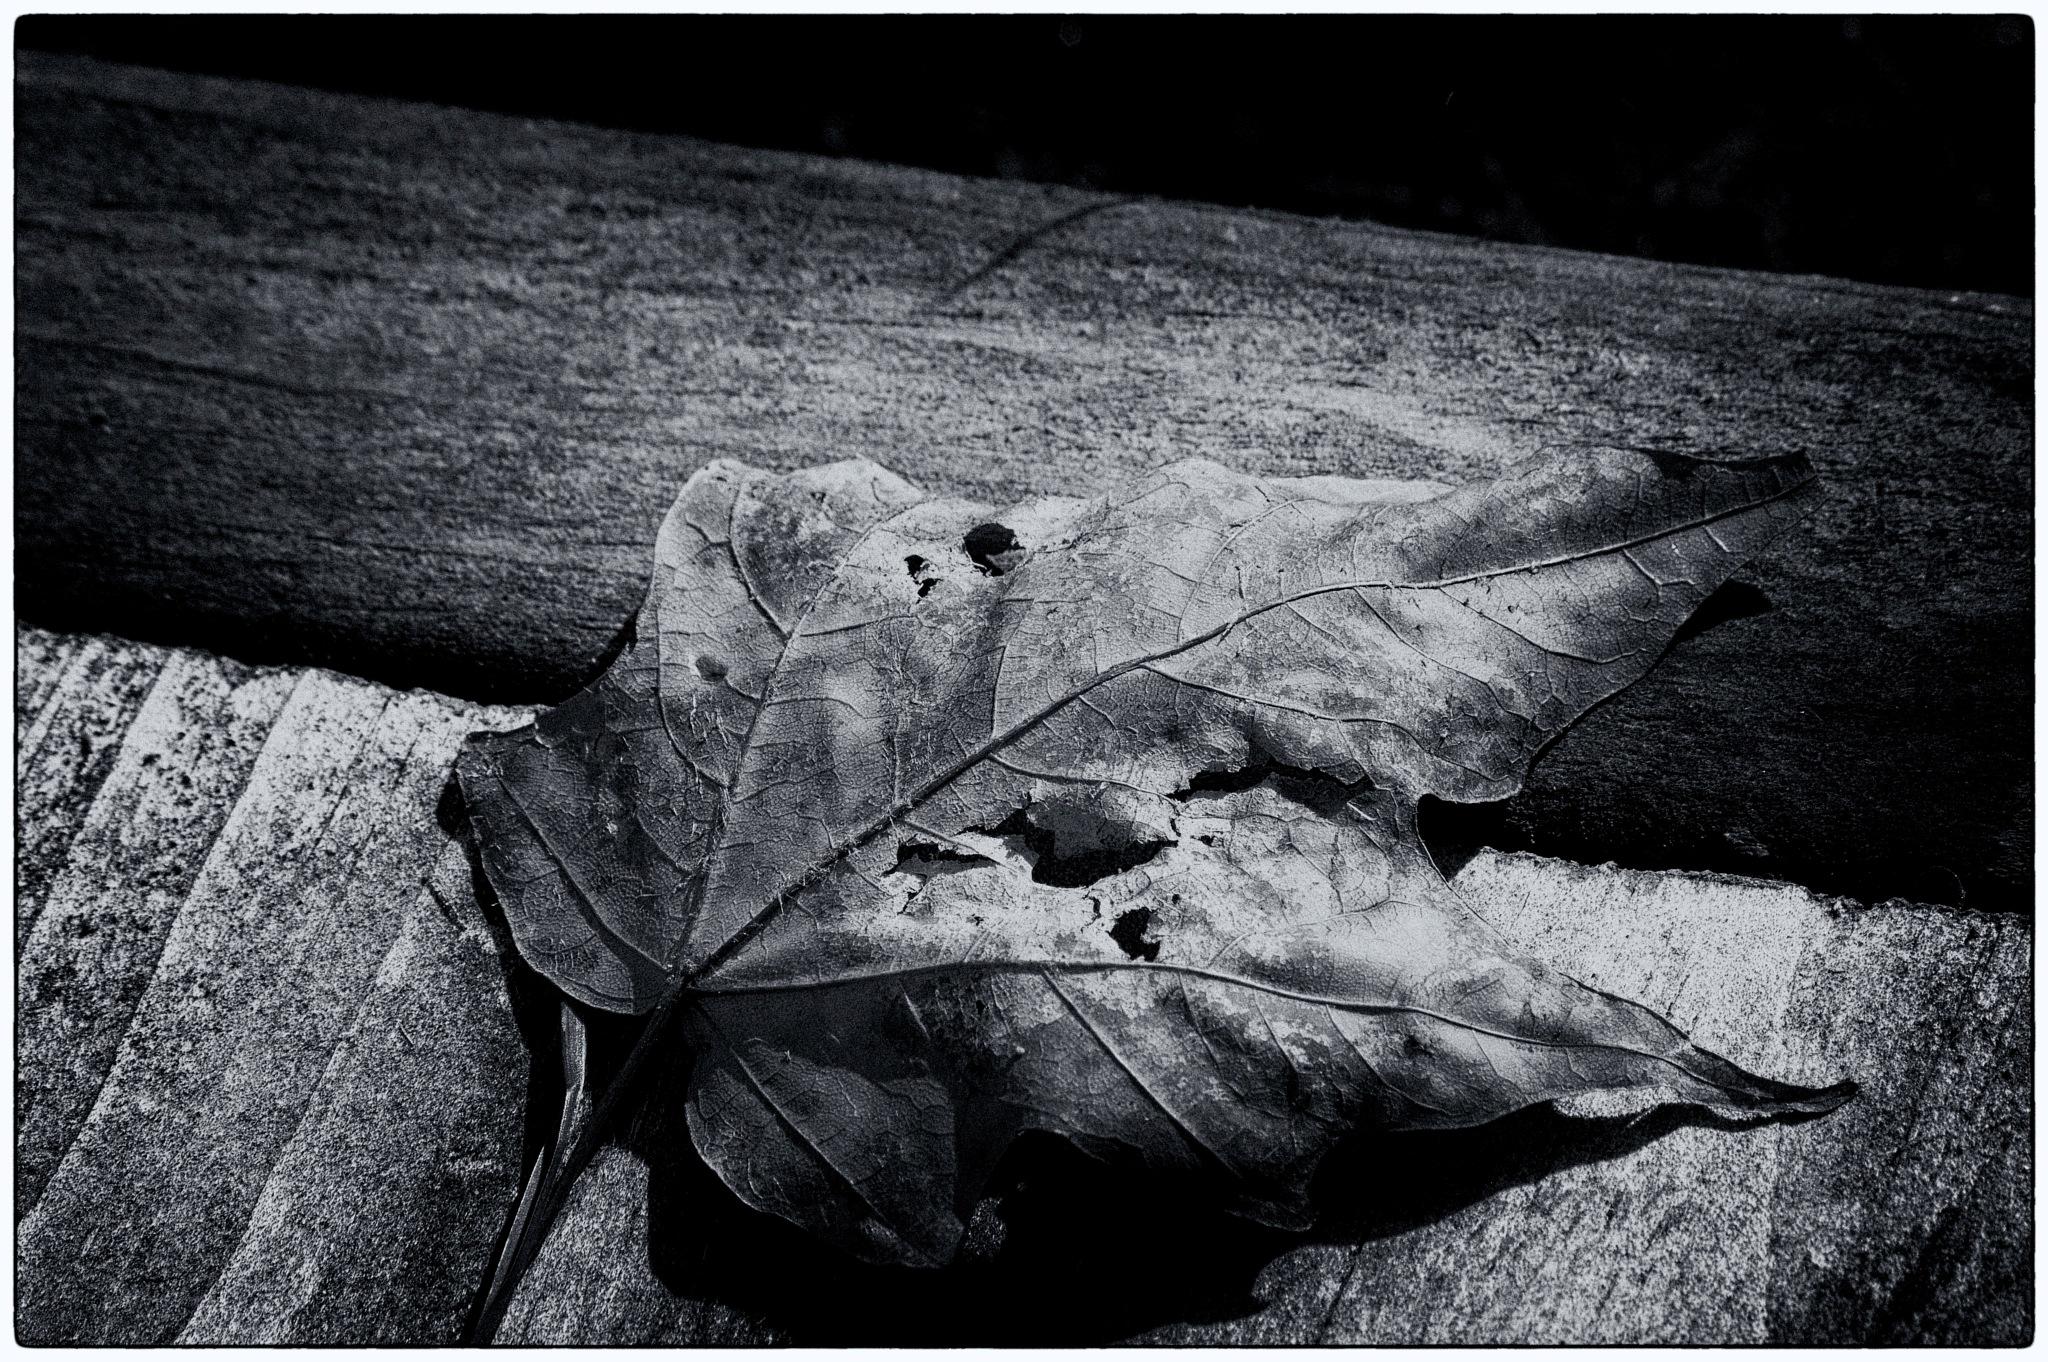 leaf by chuckhildebrandt7